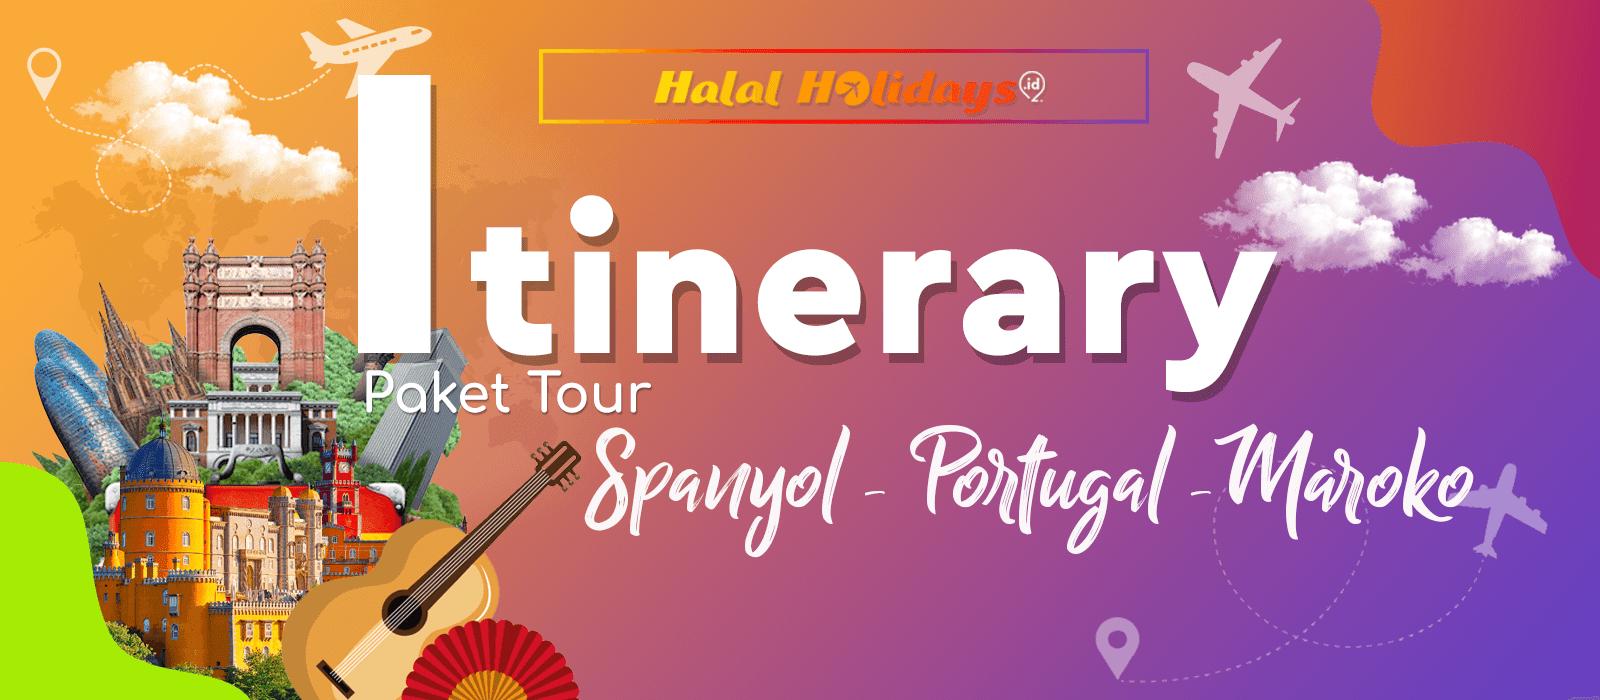 Itinerary Paket Tour Spanyol Portugal Maroko 13 Hari